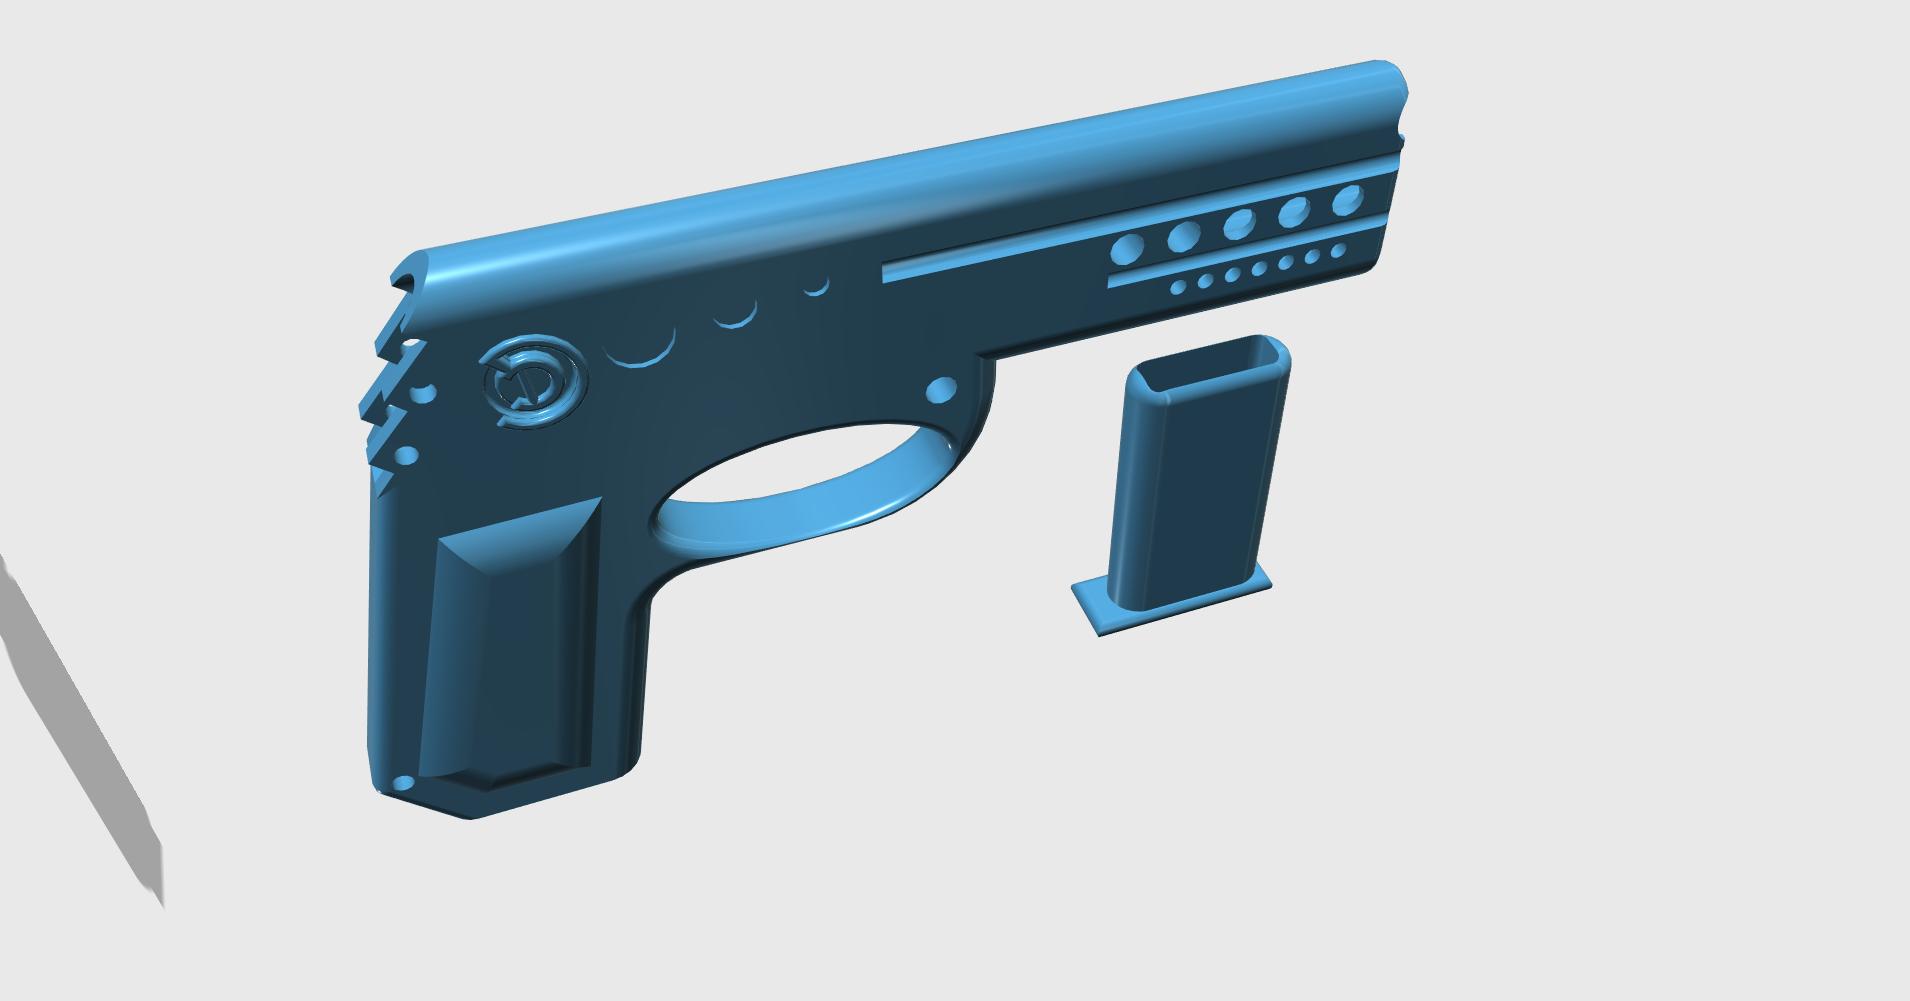 rubbergun2.png Download STL file GUN SHOOTS RUBBERBAND  • 3D printing object, JonathanOlivarDizon